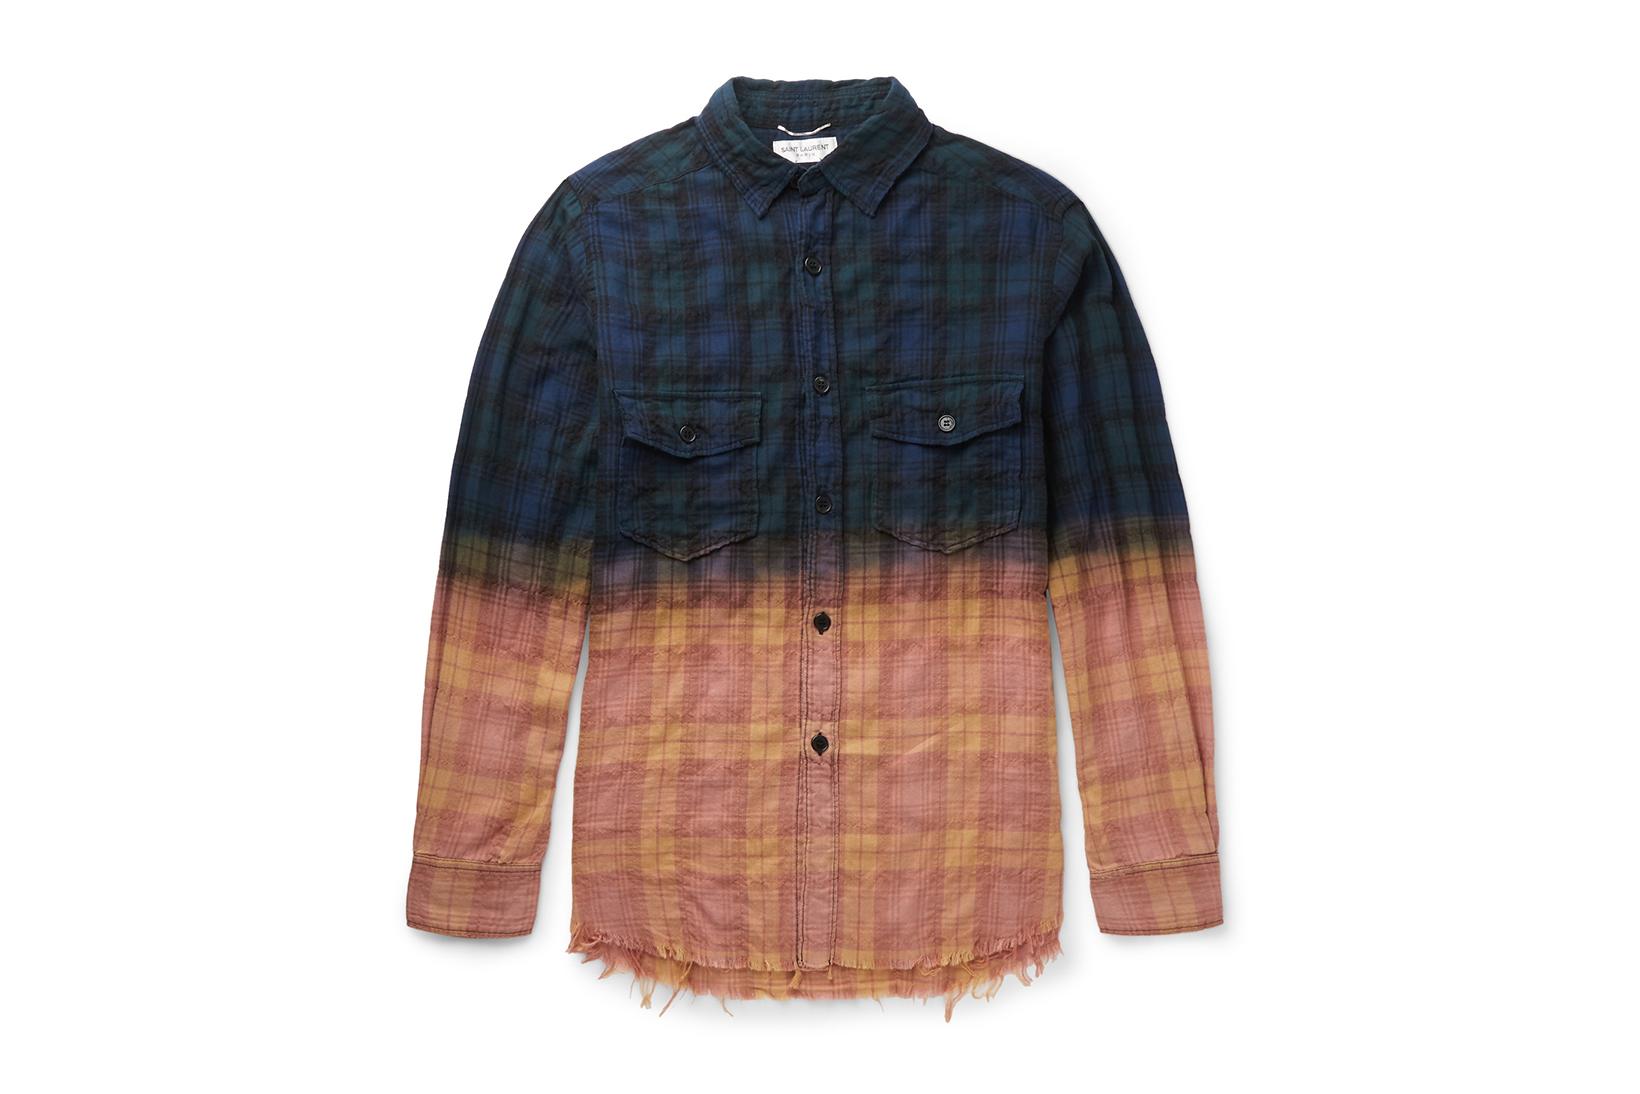 Saint Laurent Distressed Two-Toned Shirt